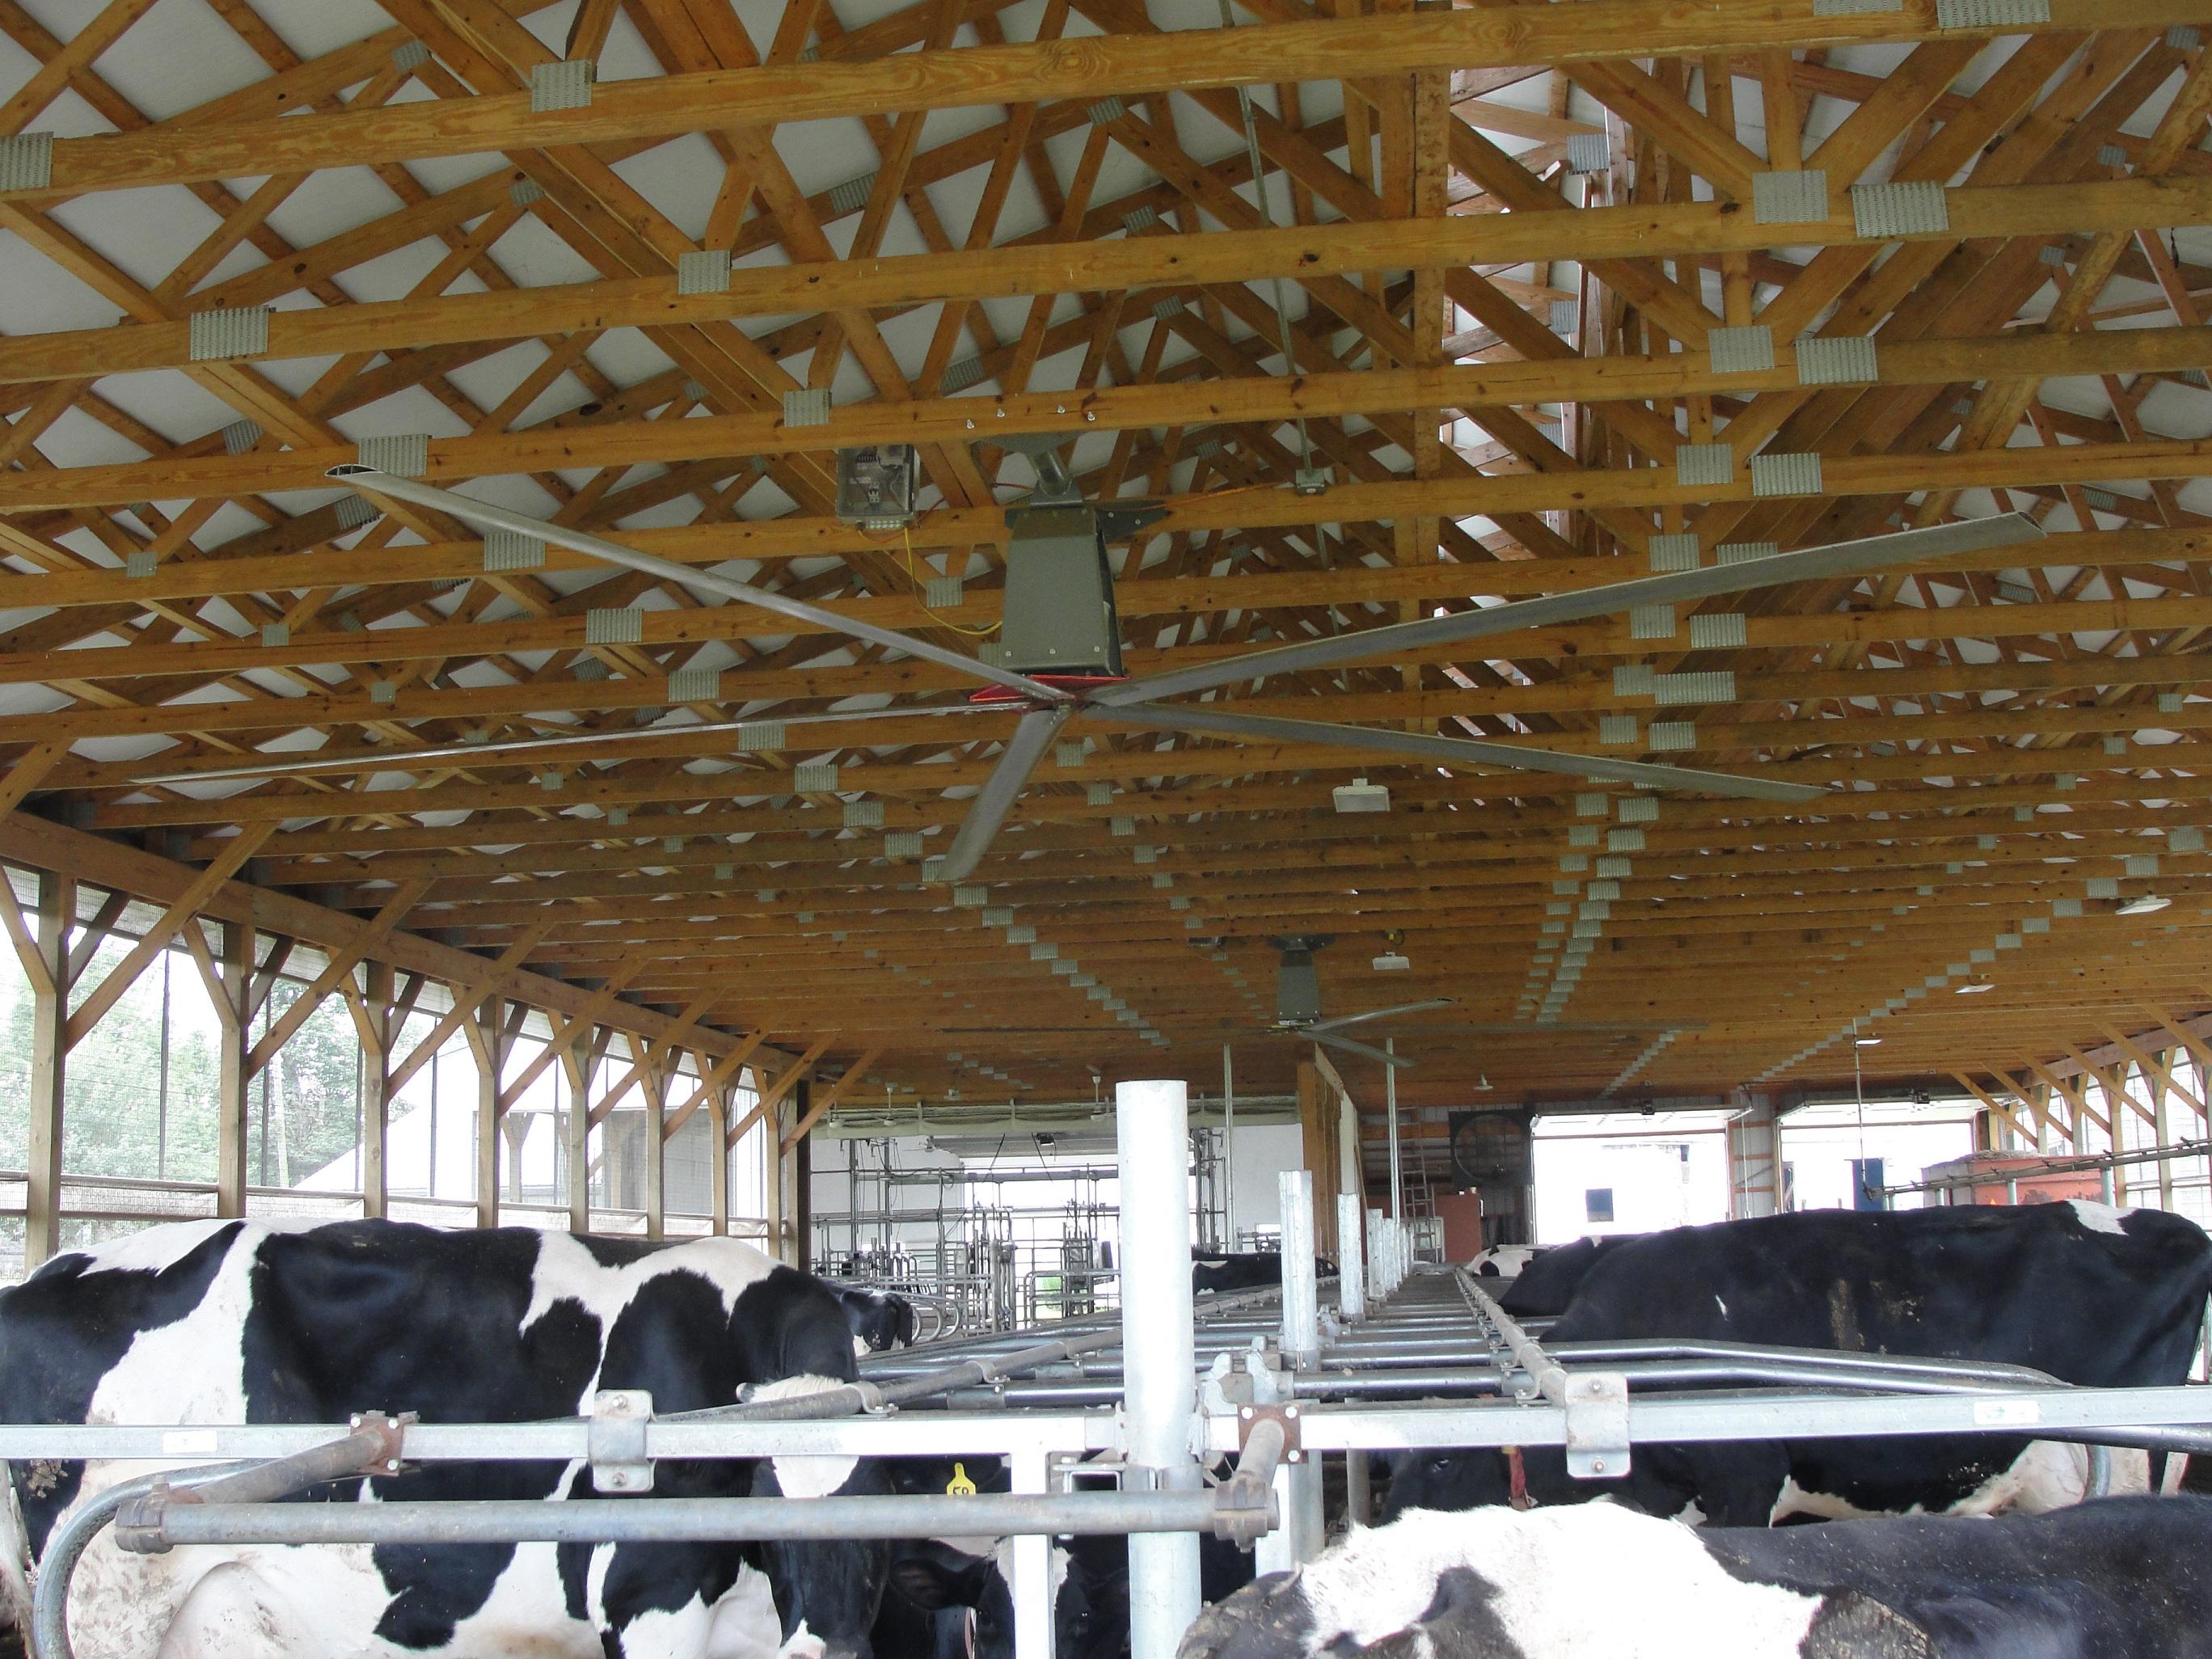 Big ceiling fans in a dairy barn